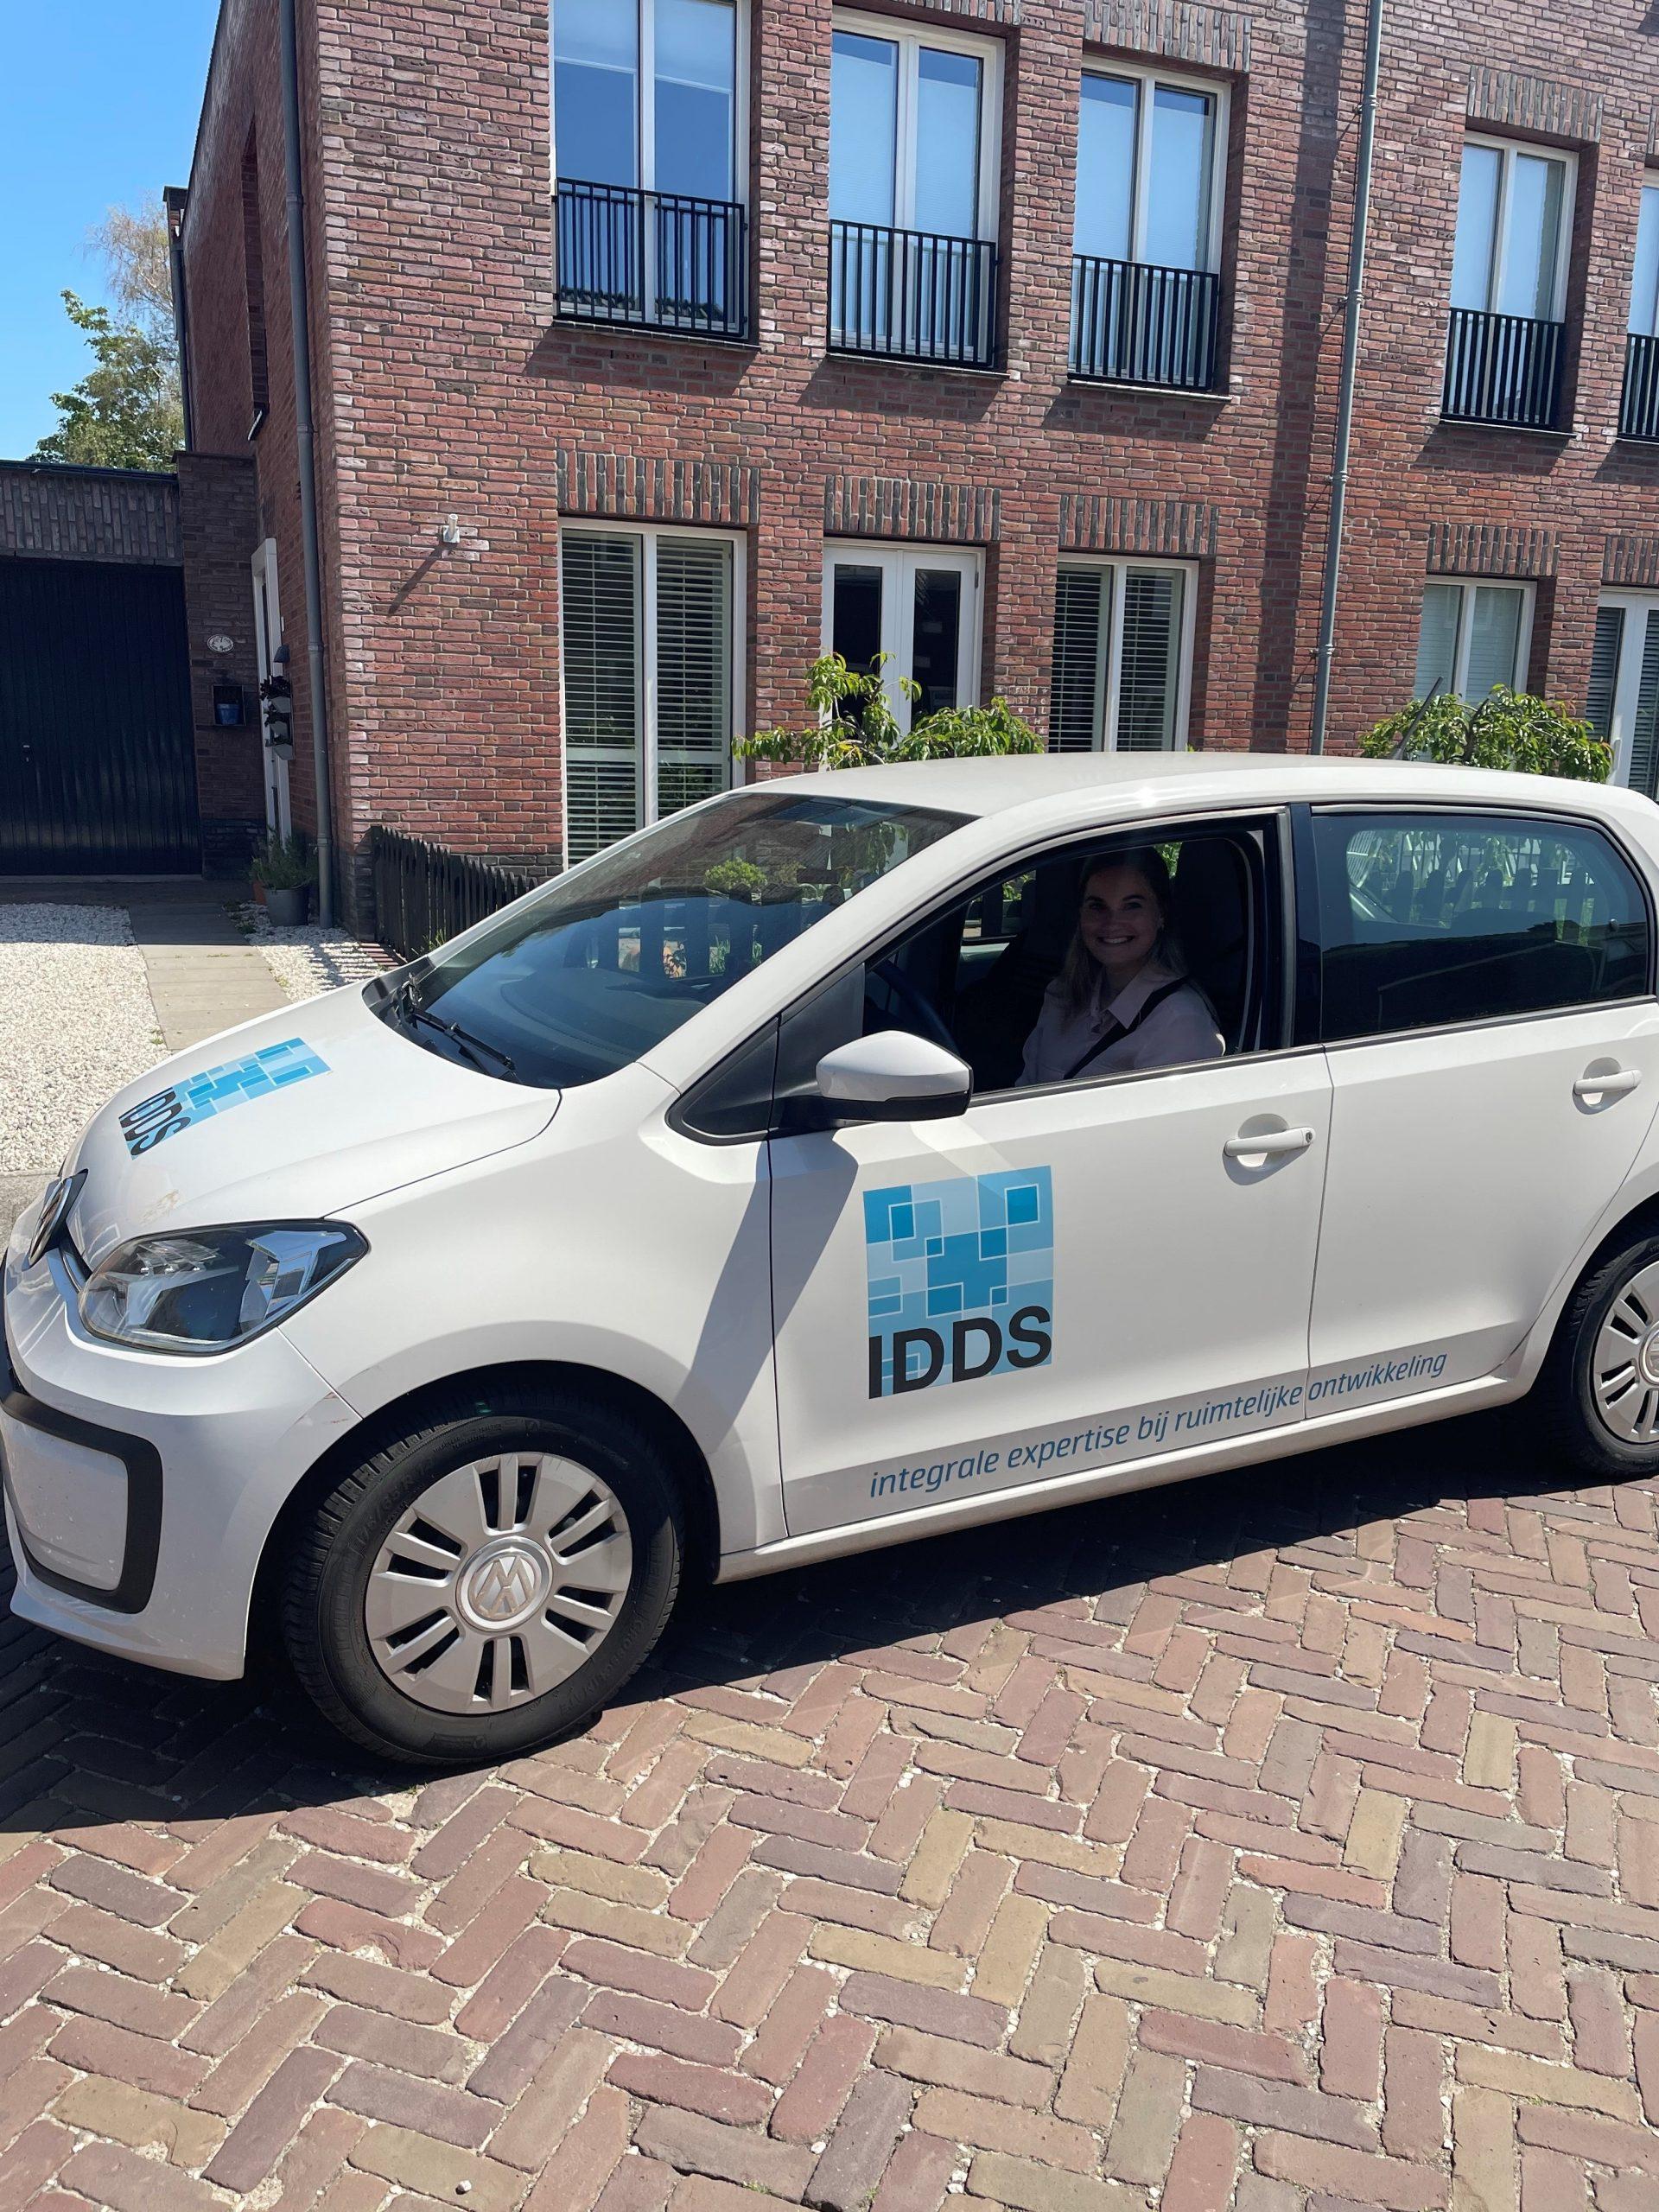 Pernille mulder in de IDDS-auto